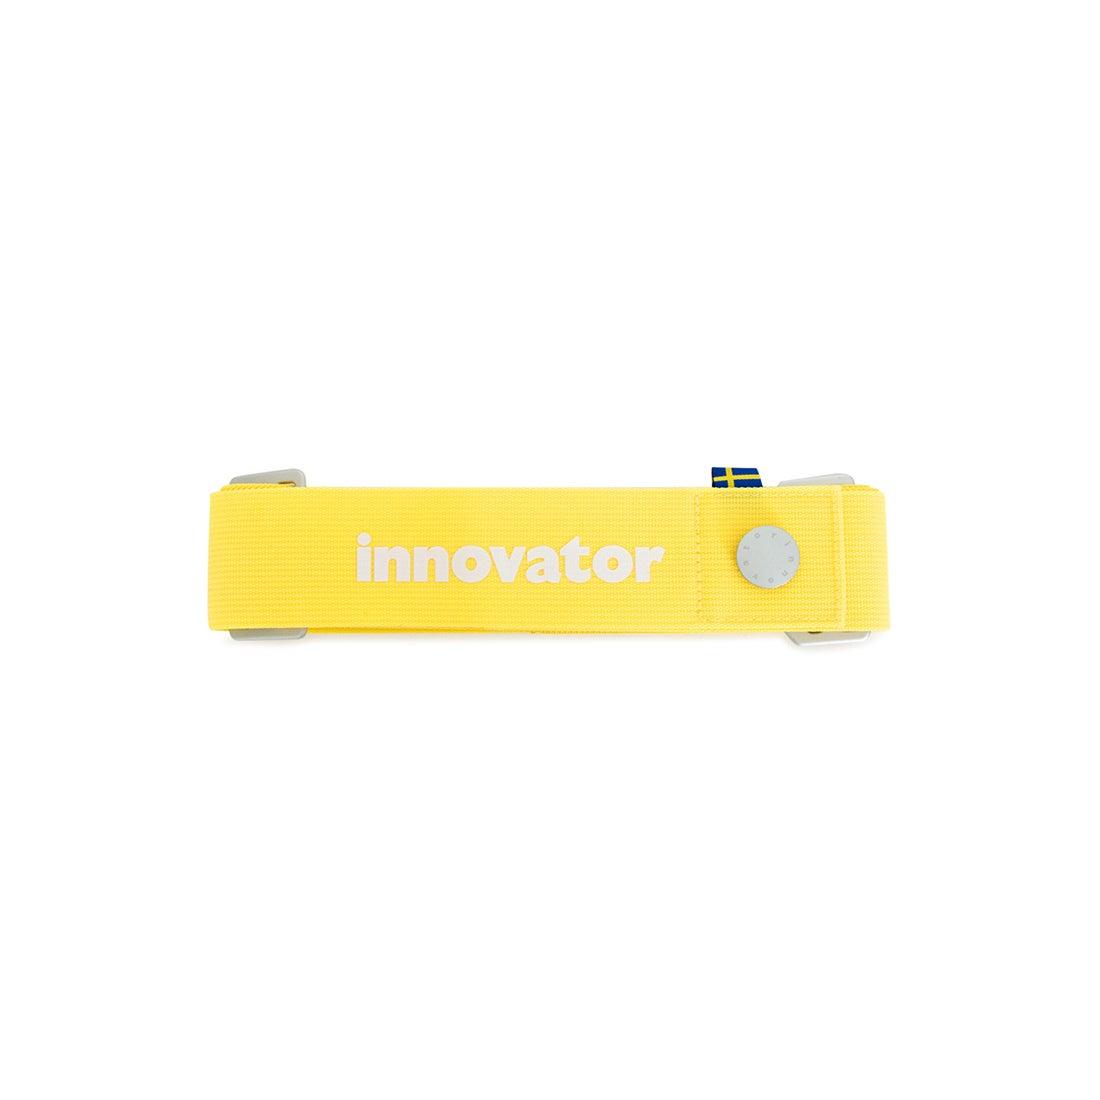 【SAC'S BAR】イノベーター innovator スーツケースベルト INT11B YELLOW メンズ